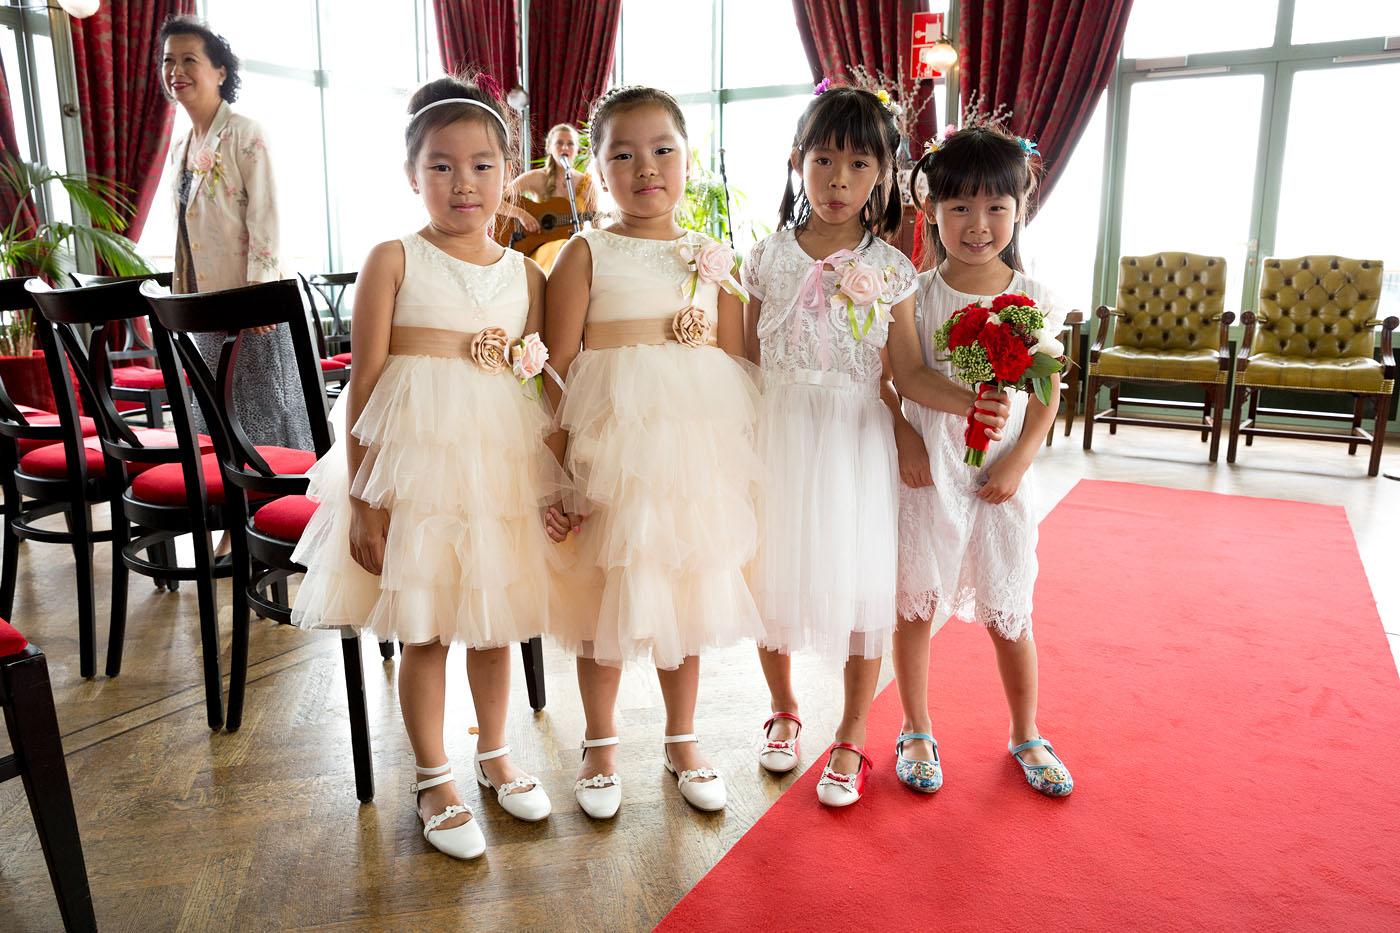 bruiloft-wedding-trouwen-fotograaf-chinees-bobhersbach-rotterdam-feest-dansen-bruidmeisjes